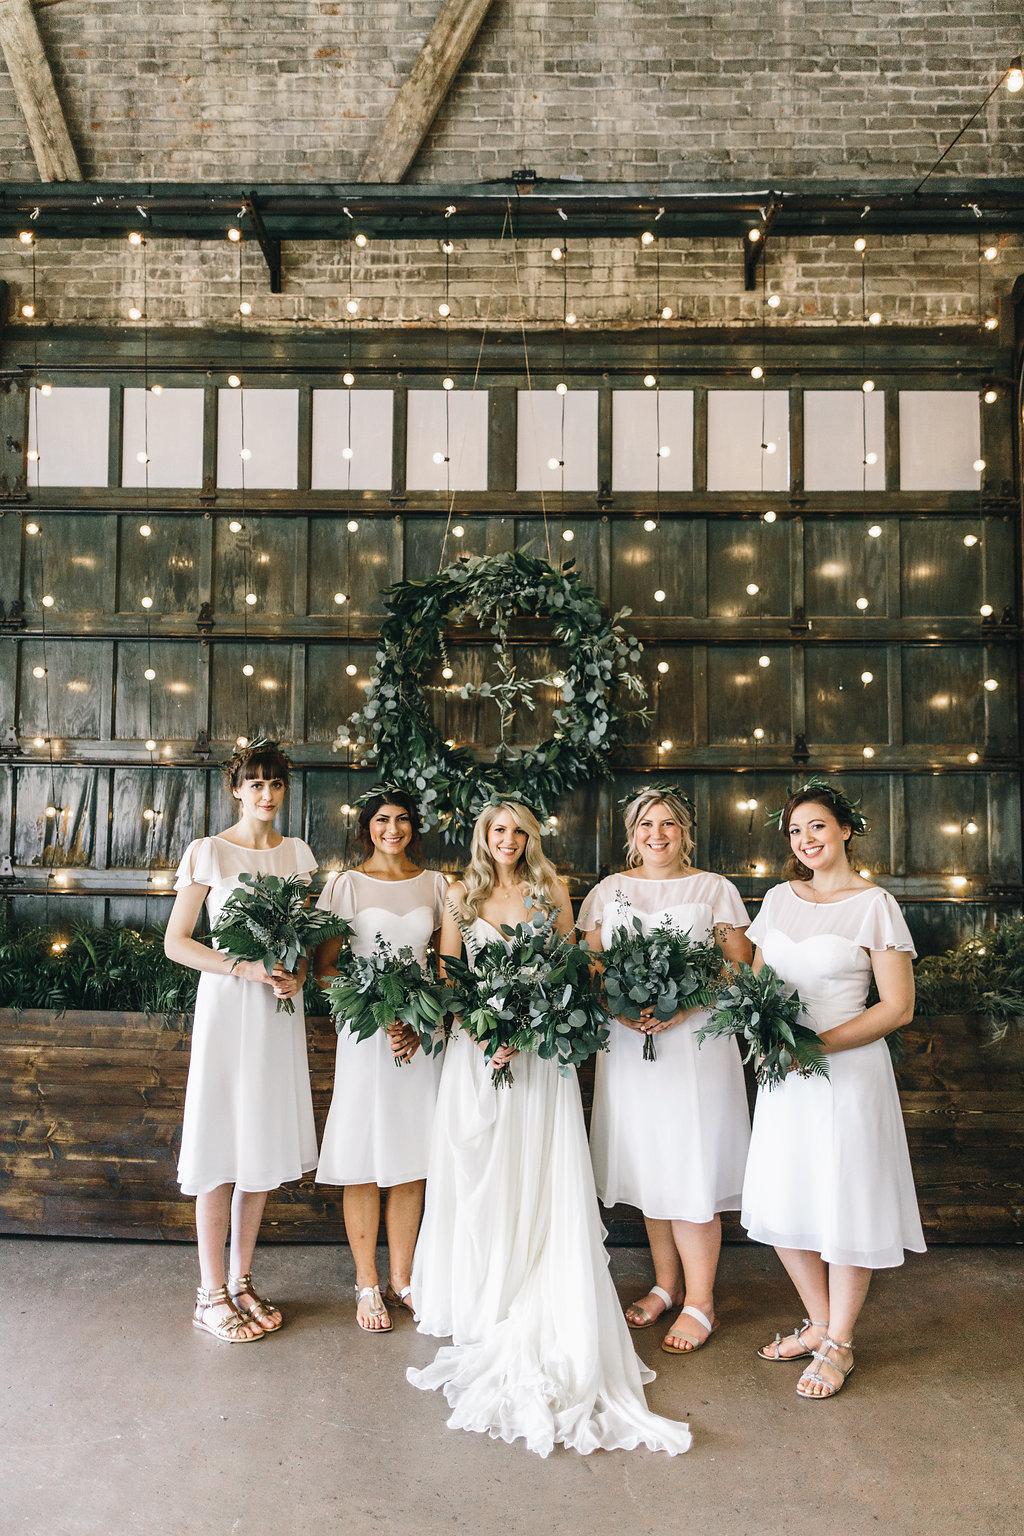 shannon-britt-mackensey-alexander-photography-green-wedding-shoes-ivory-and-beau-bridal-boutique-savannah-wedding-planner-savannah-bridal-boutique-savannah-wedding-dresses-savannah-florist-summer-solstice-wedding-boho-soho-south-cafe-wedding-19.jpg